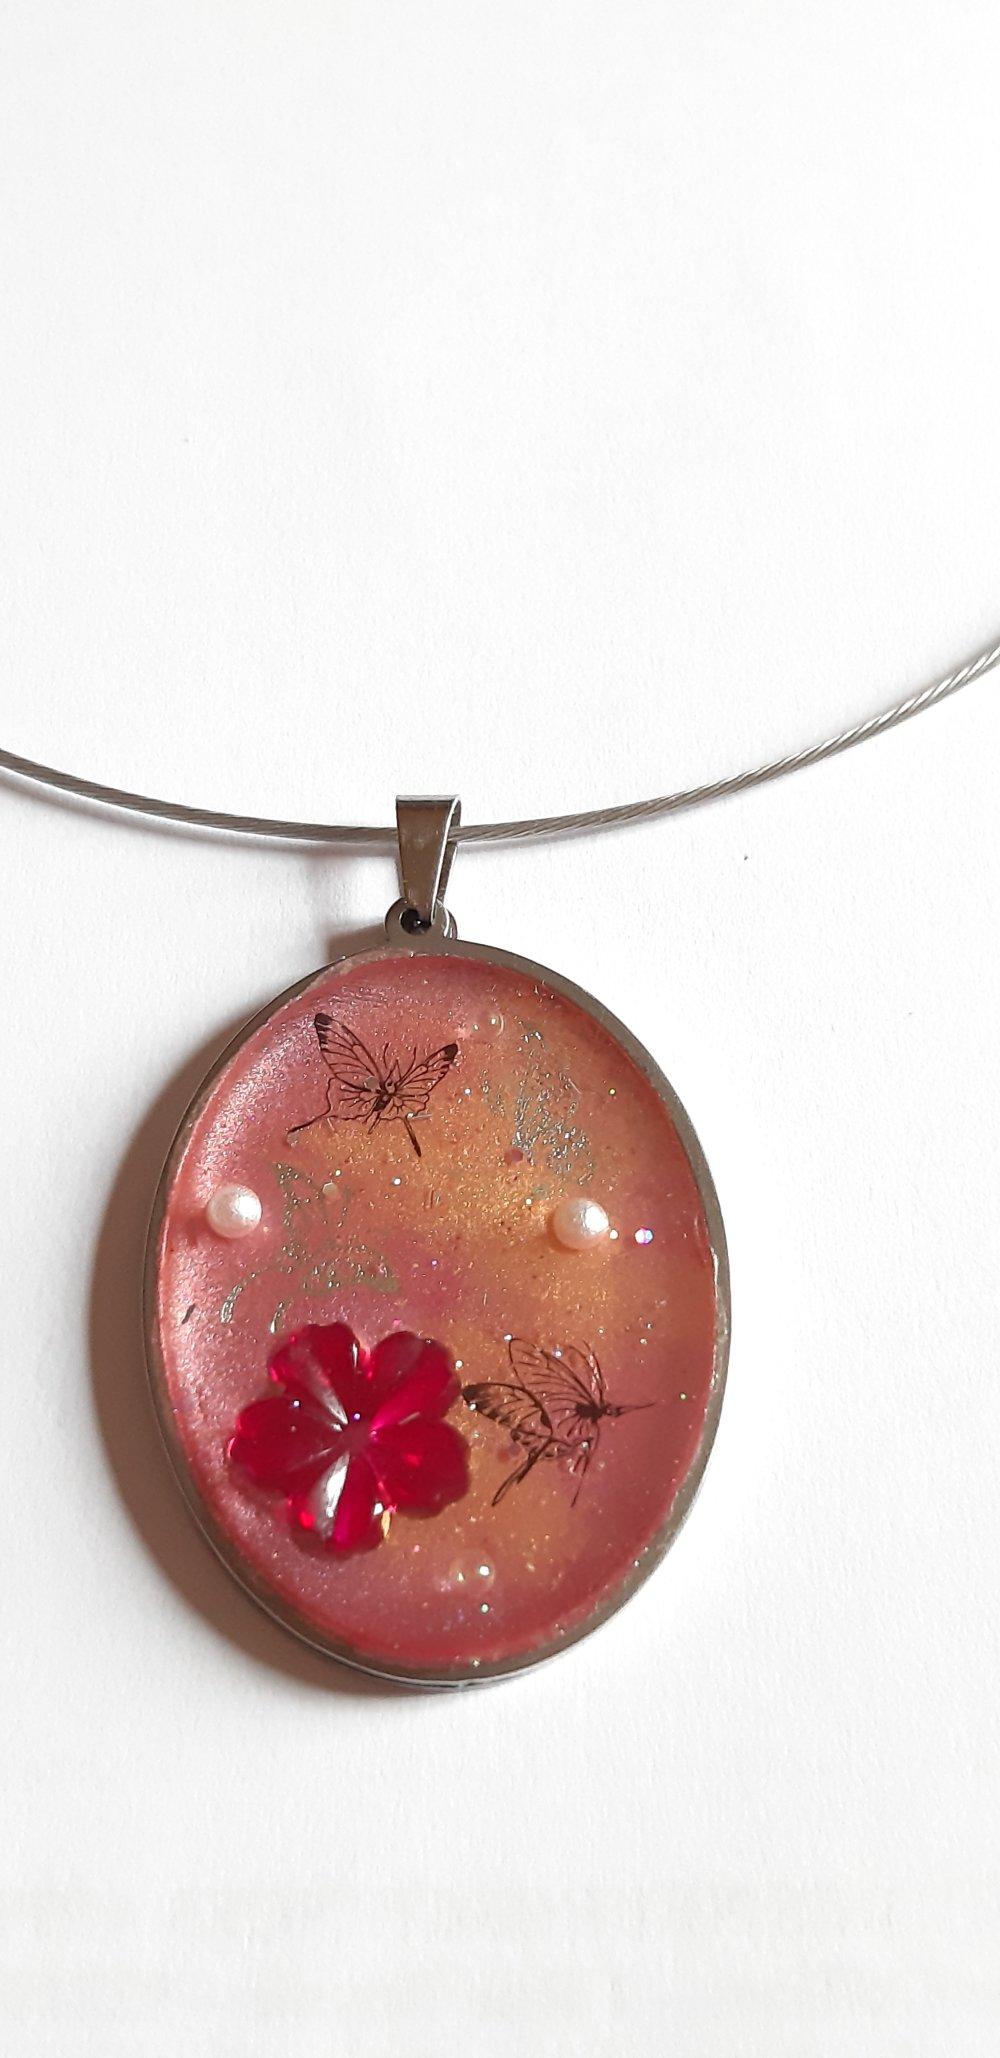 Collier avec pendentif rose en resine et incrustations